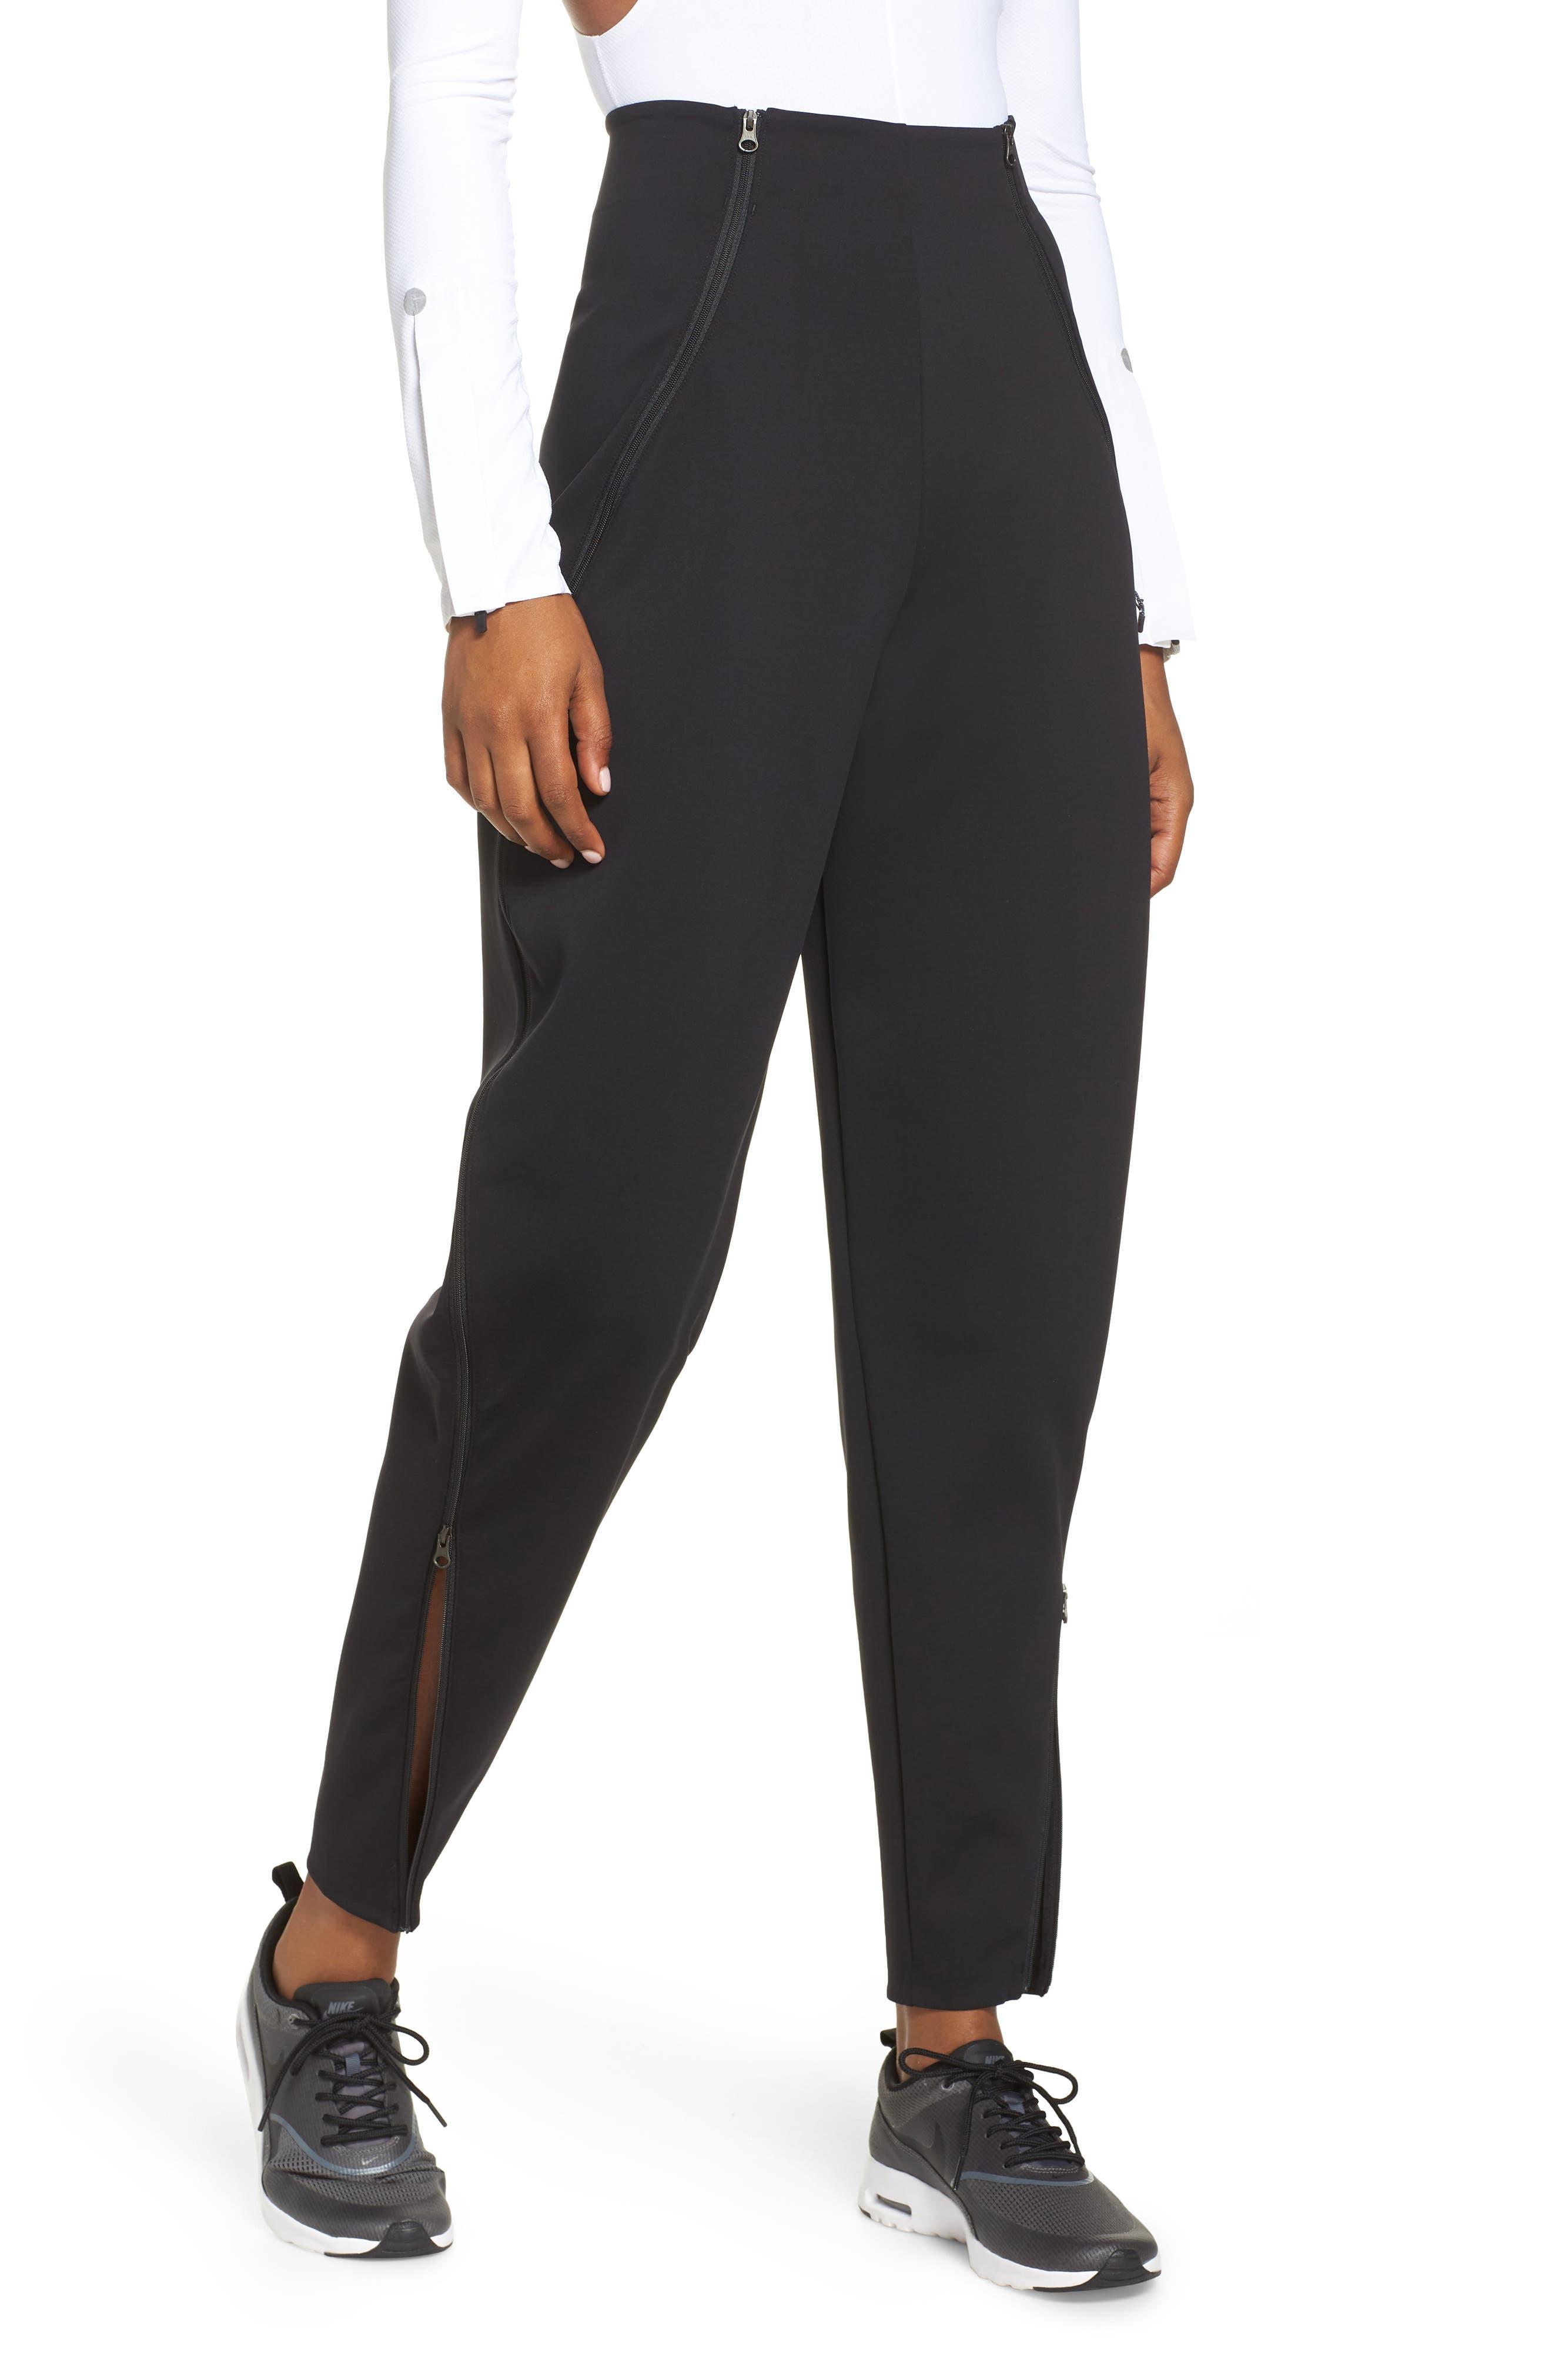 XX Project Women's Dri-FIT Training Pants,                             Main thumbnail 1, color,                             BLACK